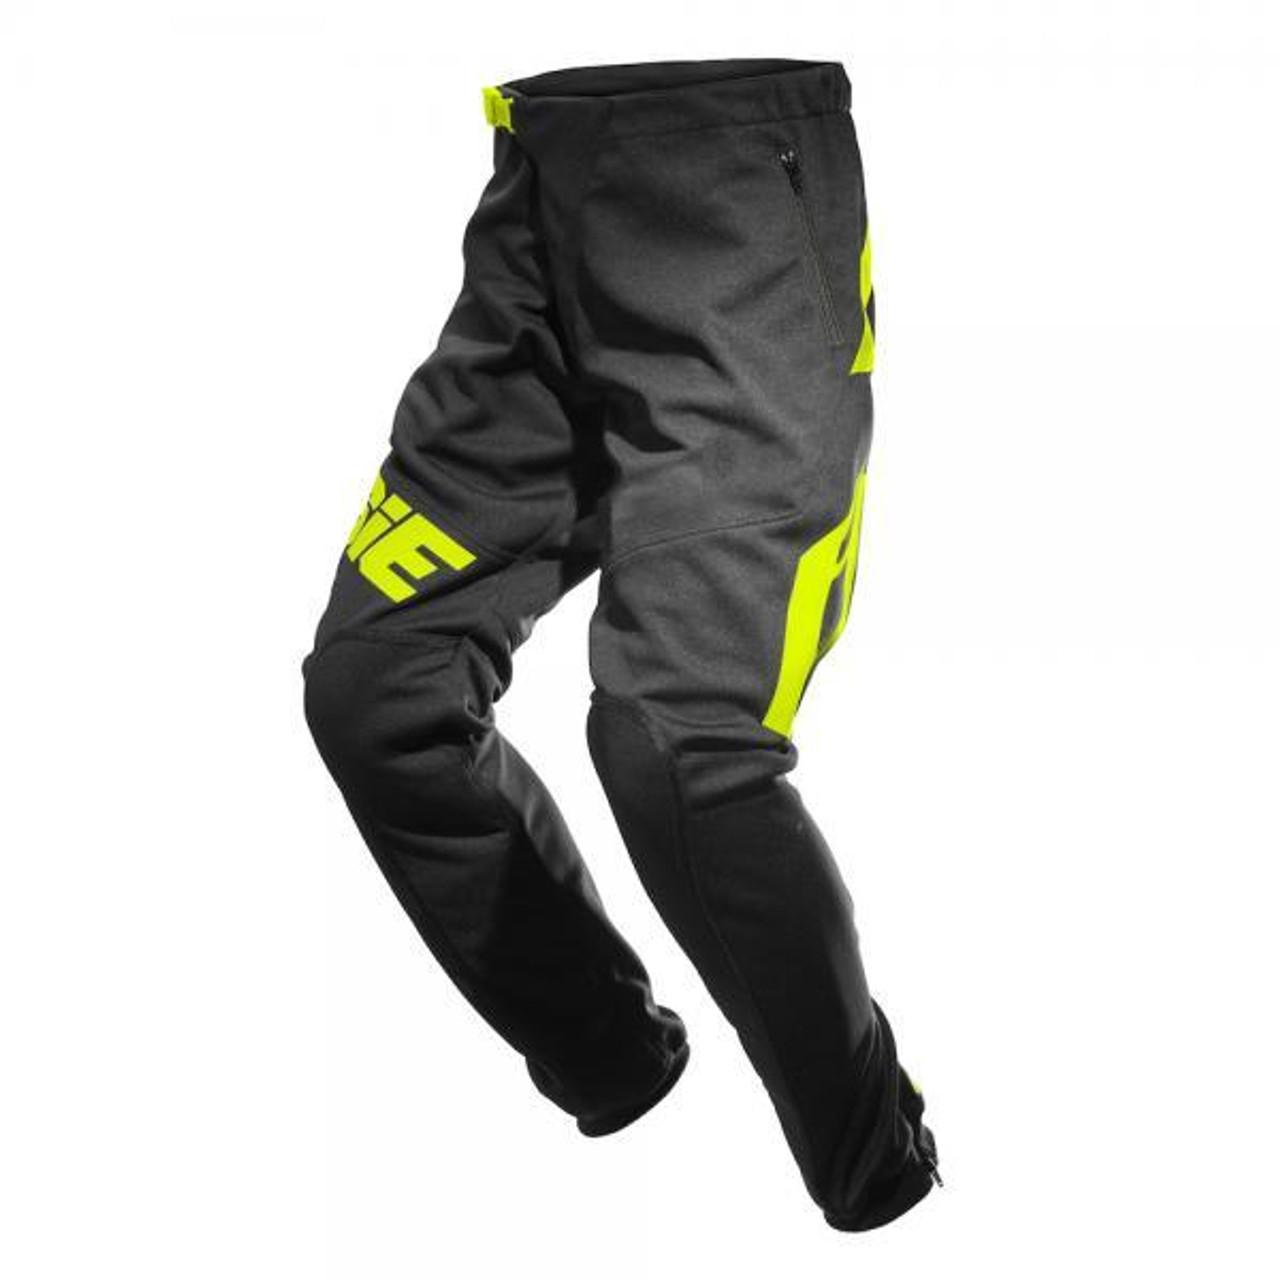 Pants Omnia black/ fluo yellow